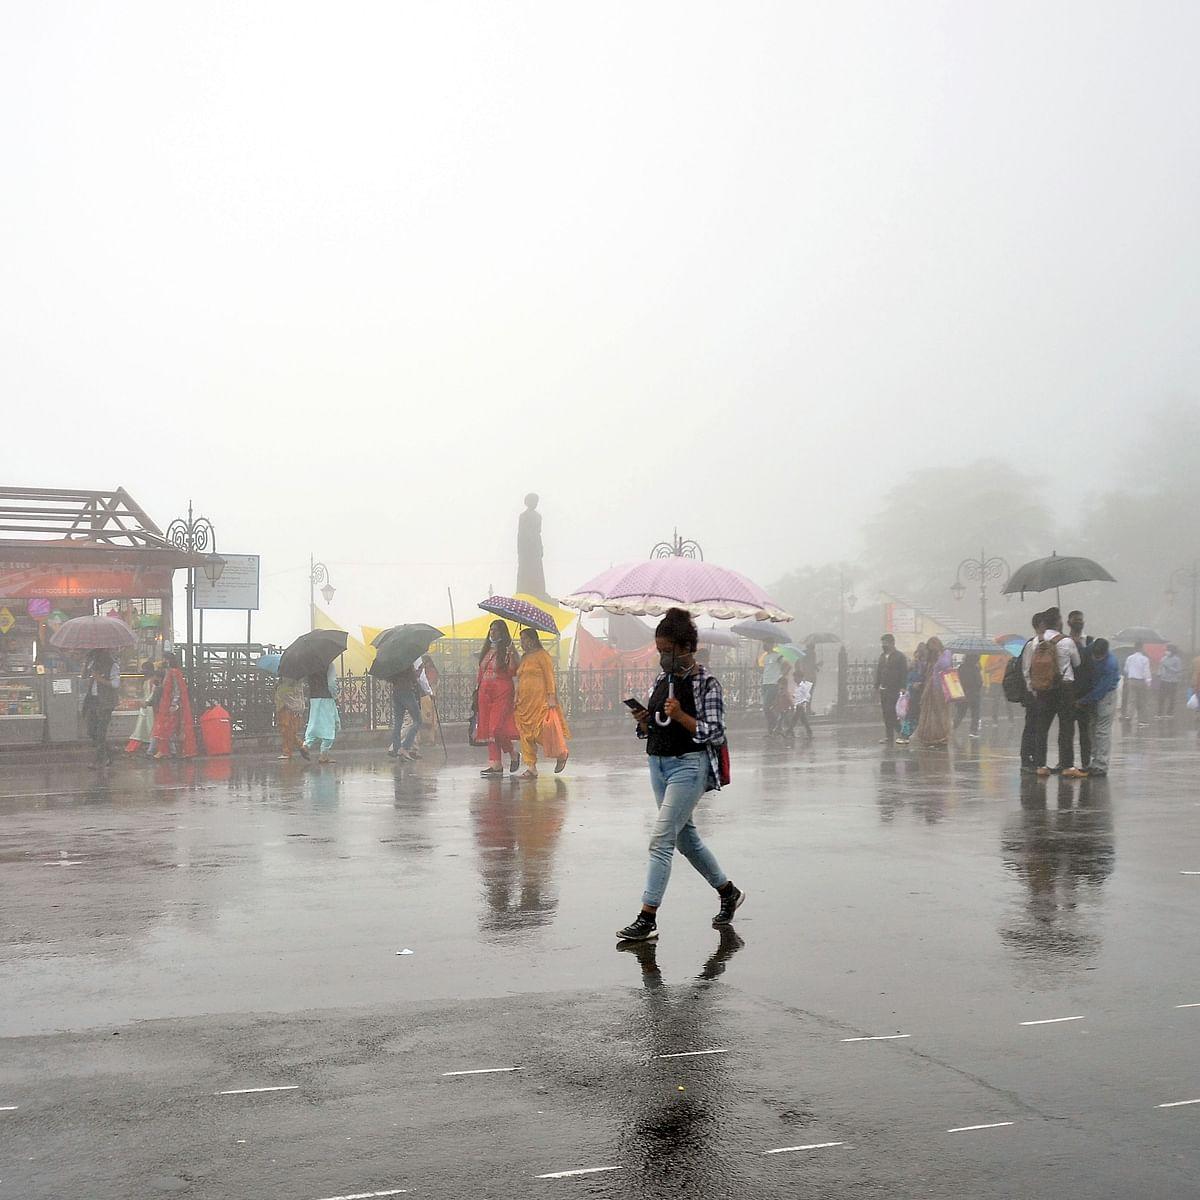 10 missing, 1 injured in flash floods due to cloudburst in Himachal Pradesh